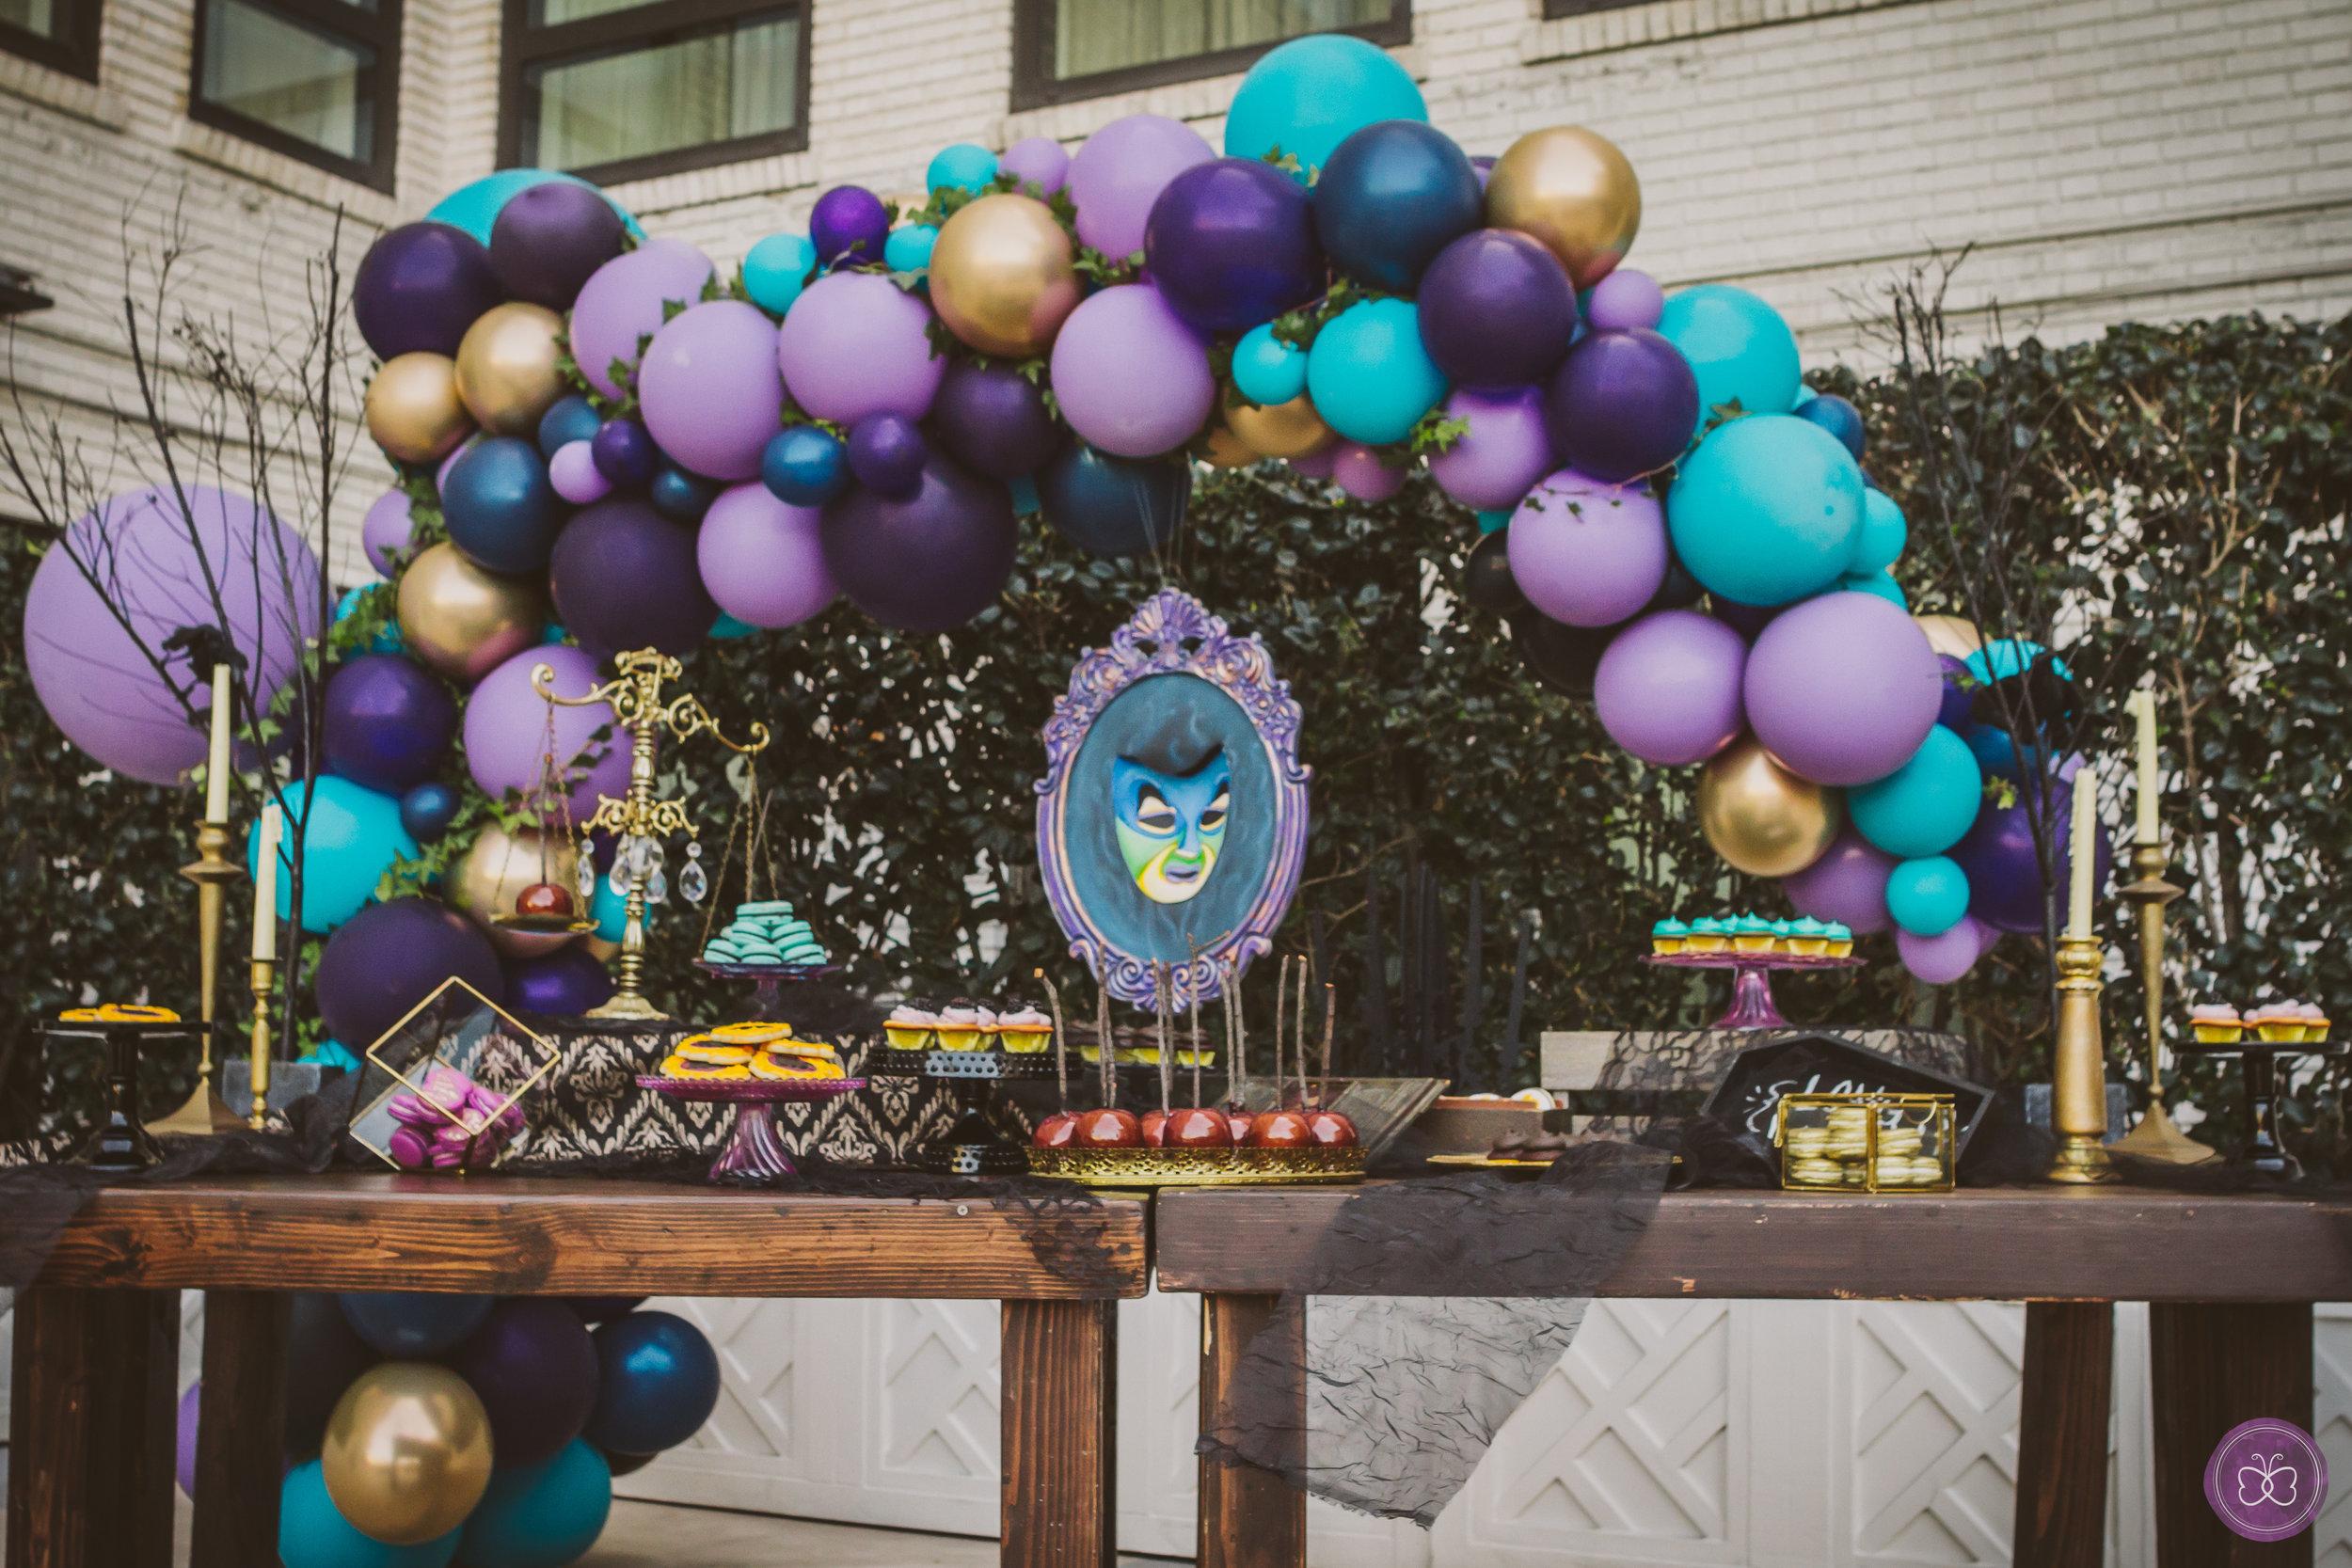 Beverly Wilshire Hotel Descendants Party 2018-7213.jpg